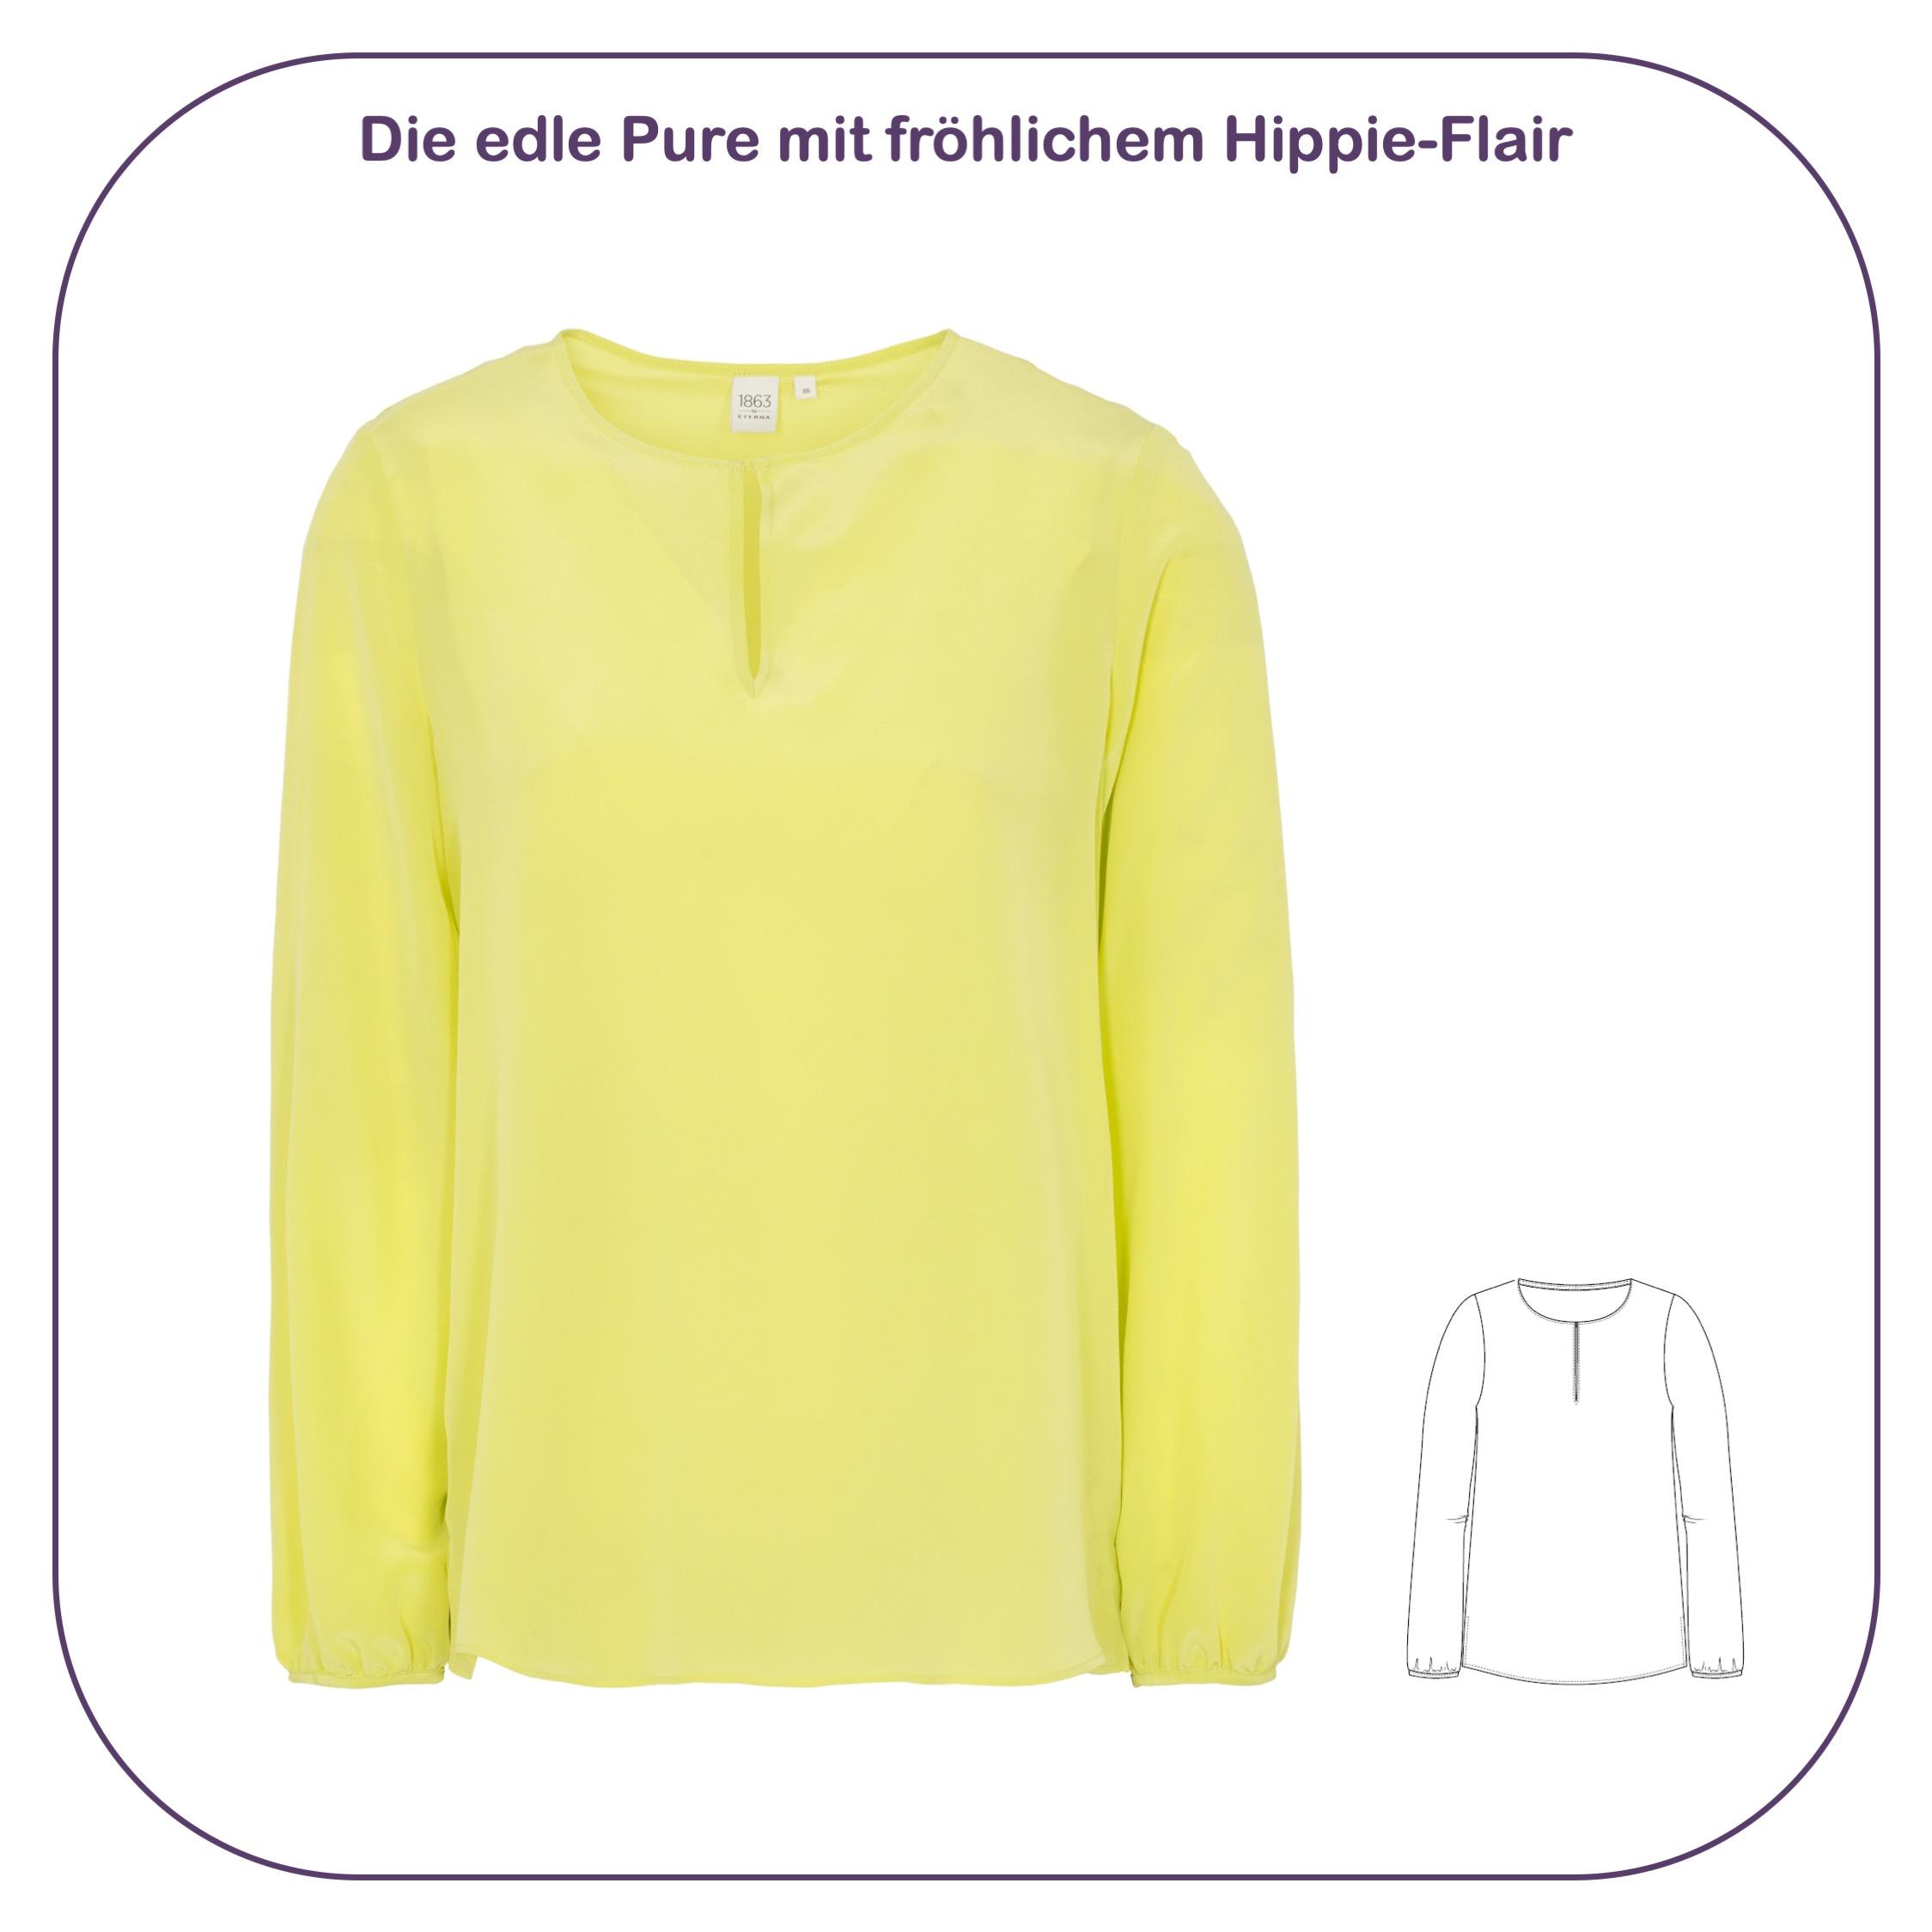 Pure, edle Seidenbluse in Gelb mit Hippie-Flair